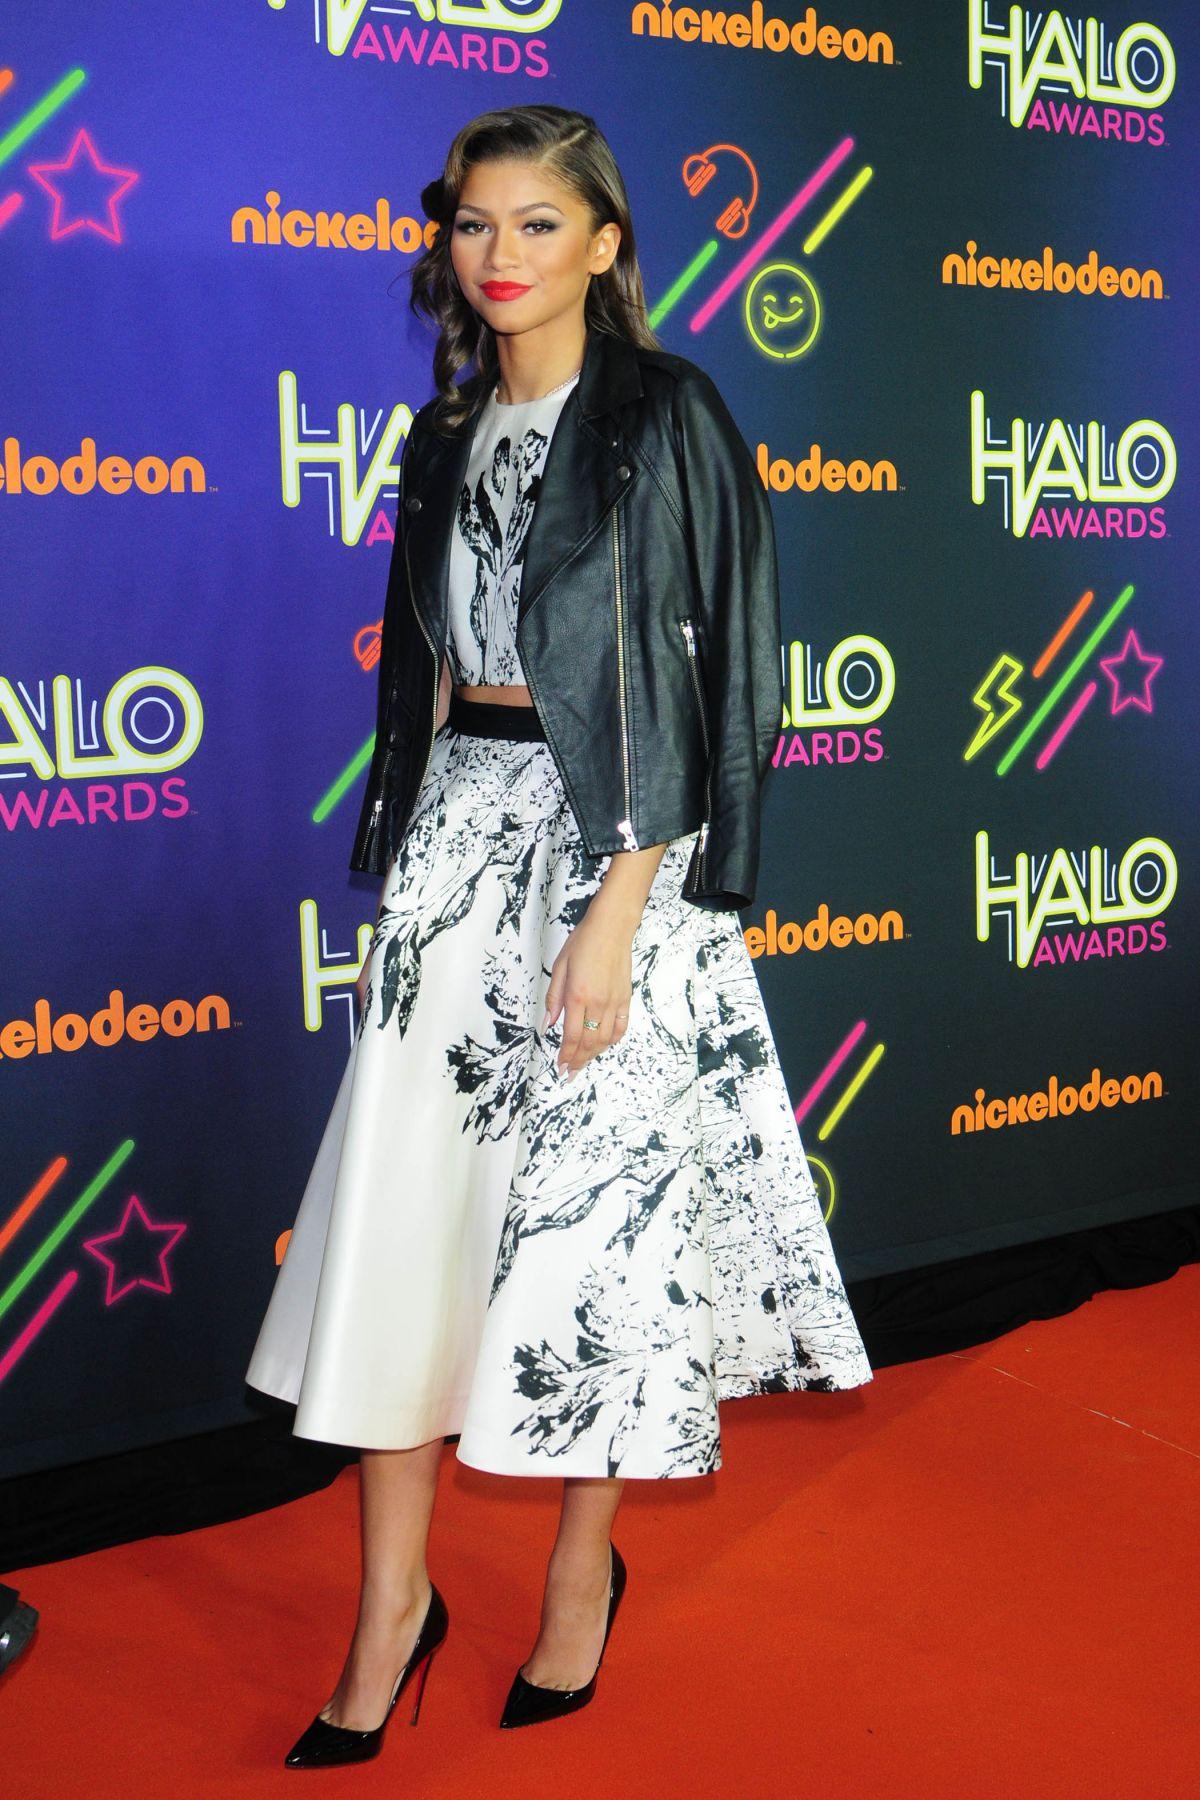 zendaya-coleman-at-nickelodeon-halo-awards-2014-in-new-york_9